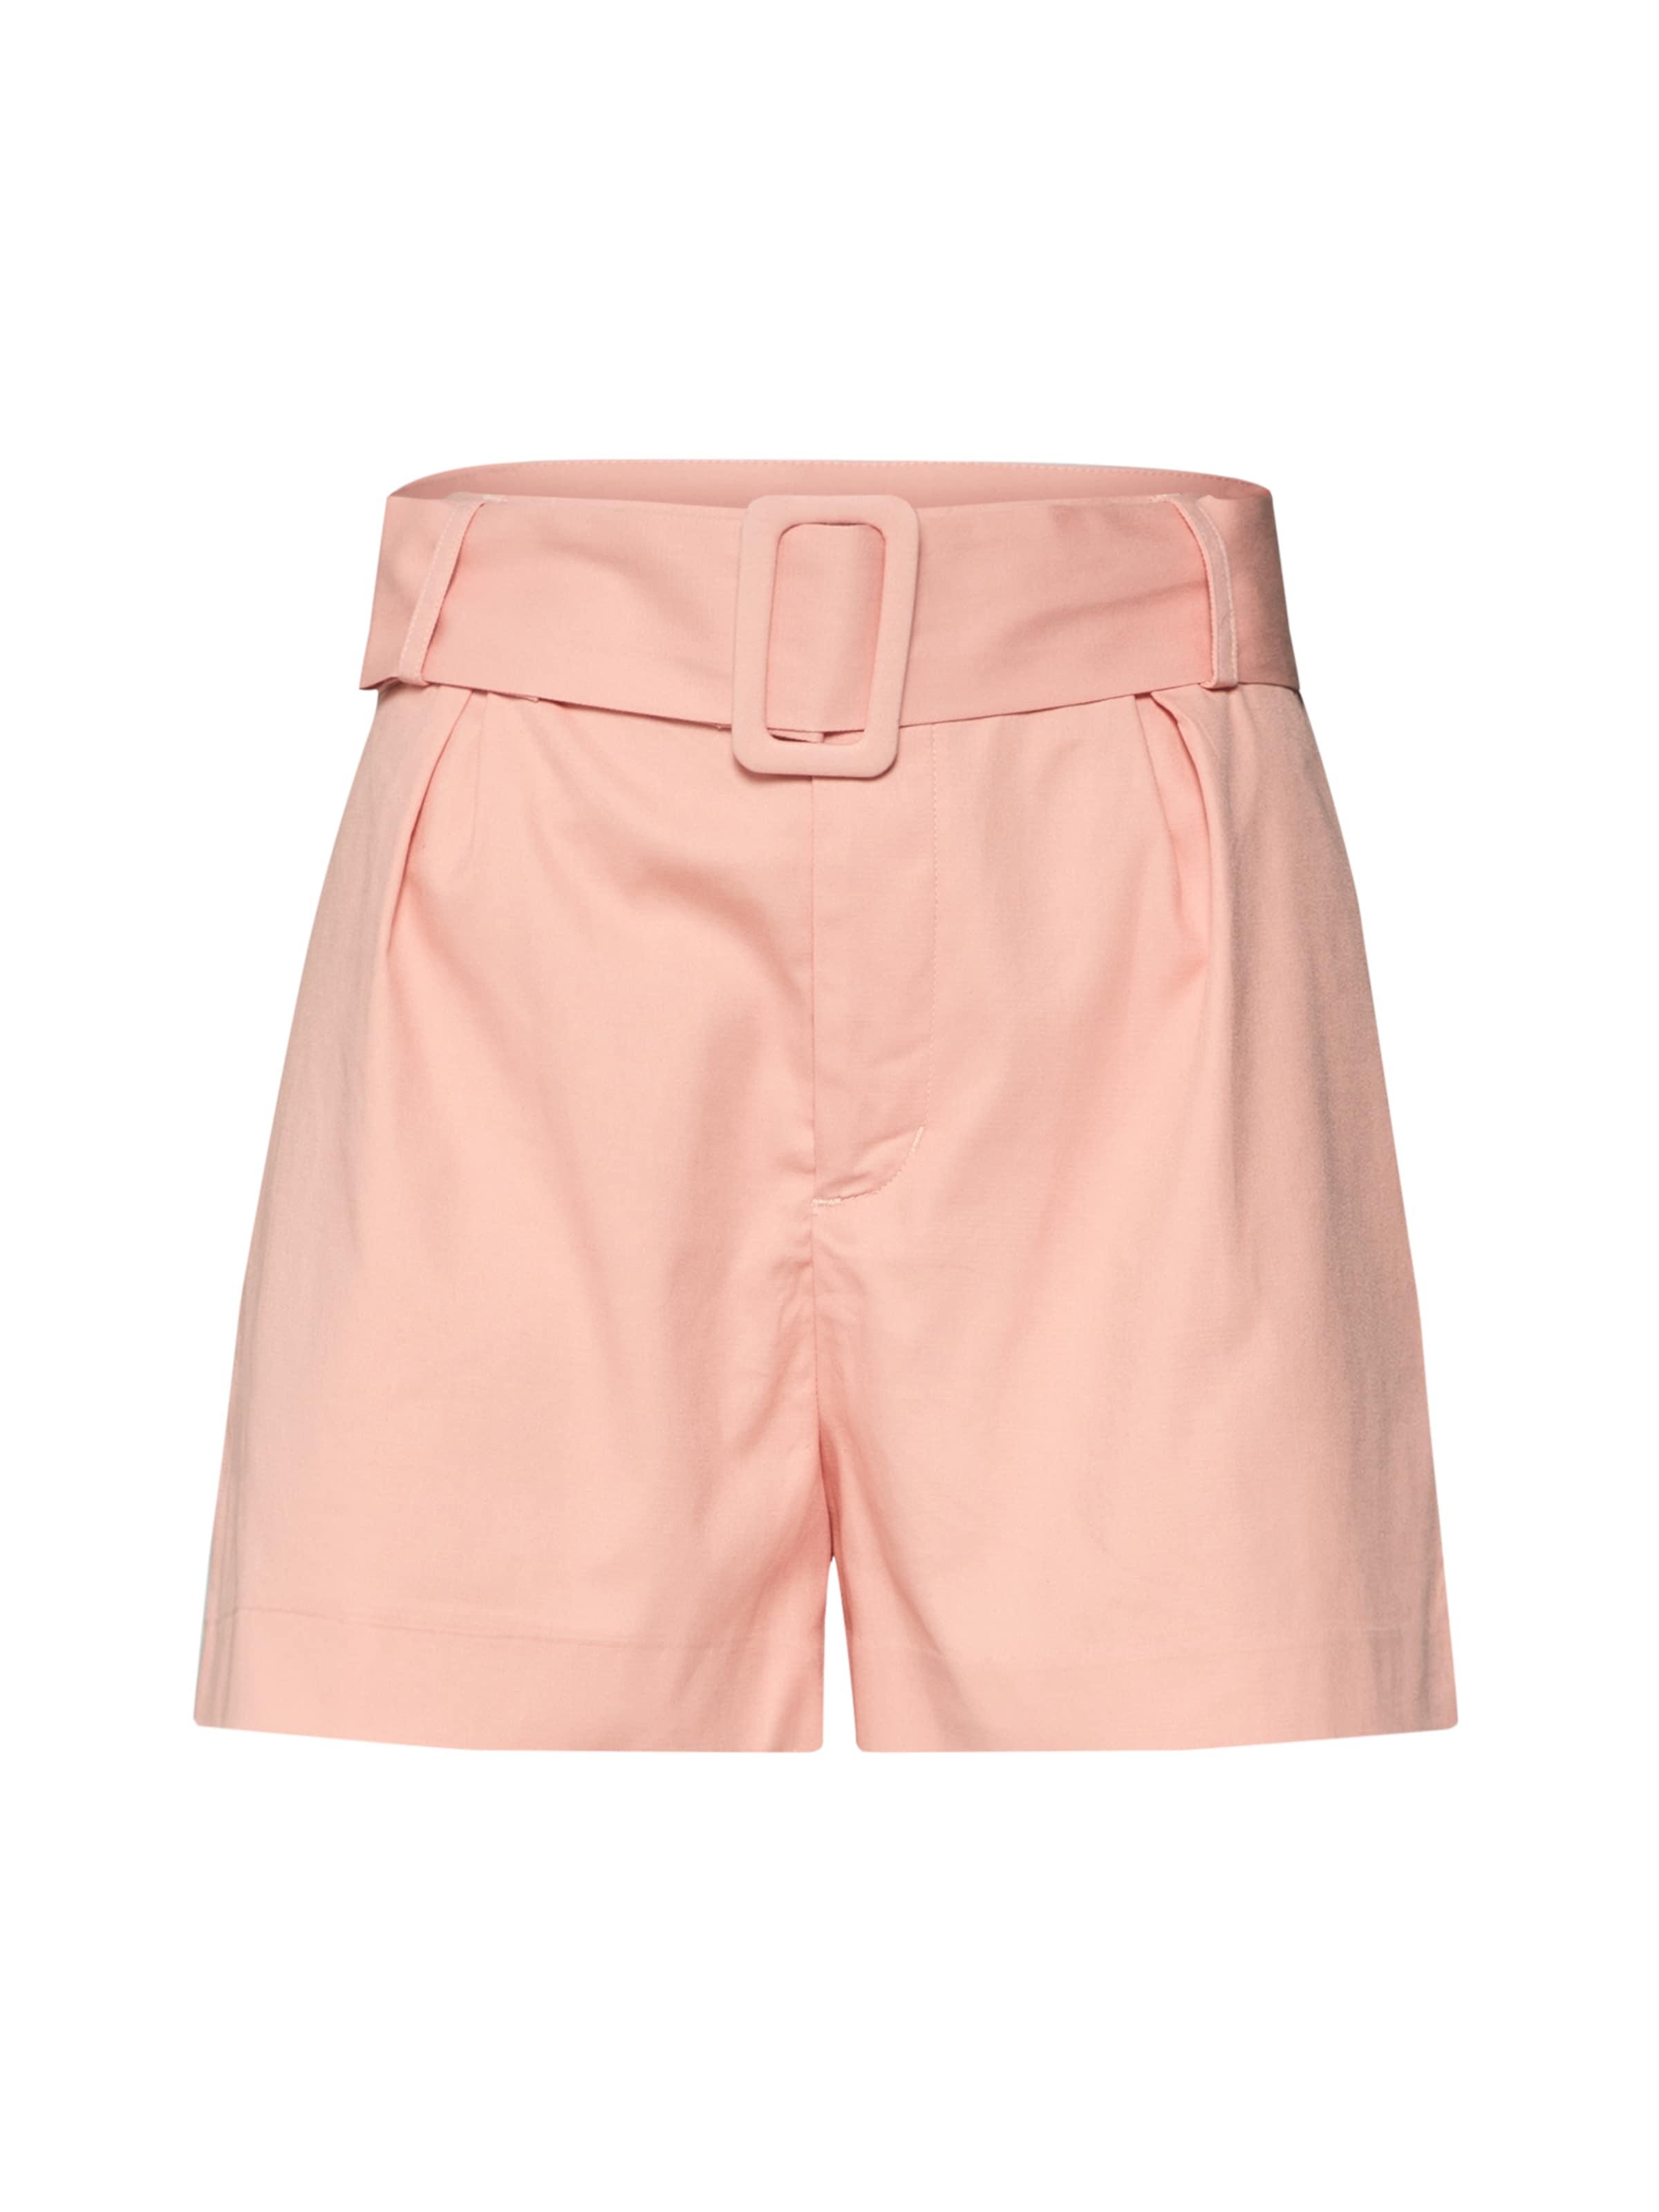 Broek Glamorous In Shorts' Perzik 'ladies pGLqzMSVjU